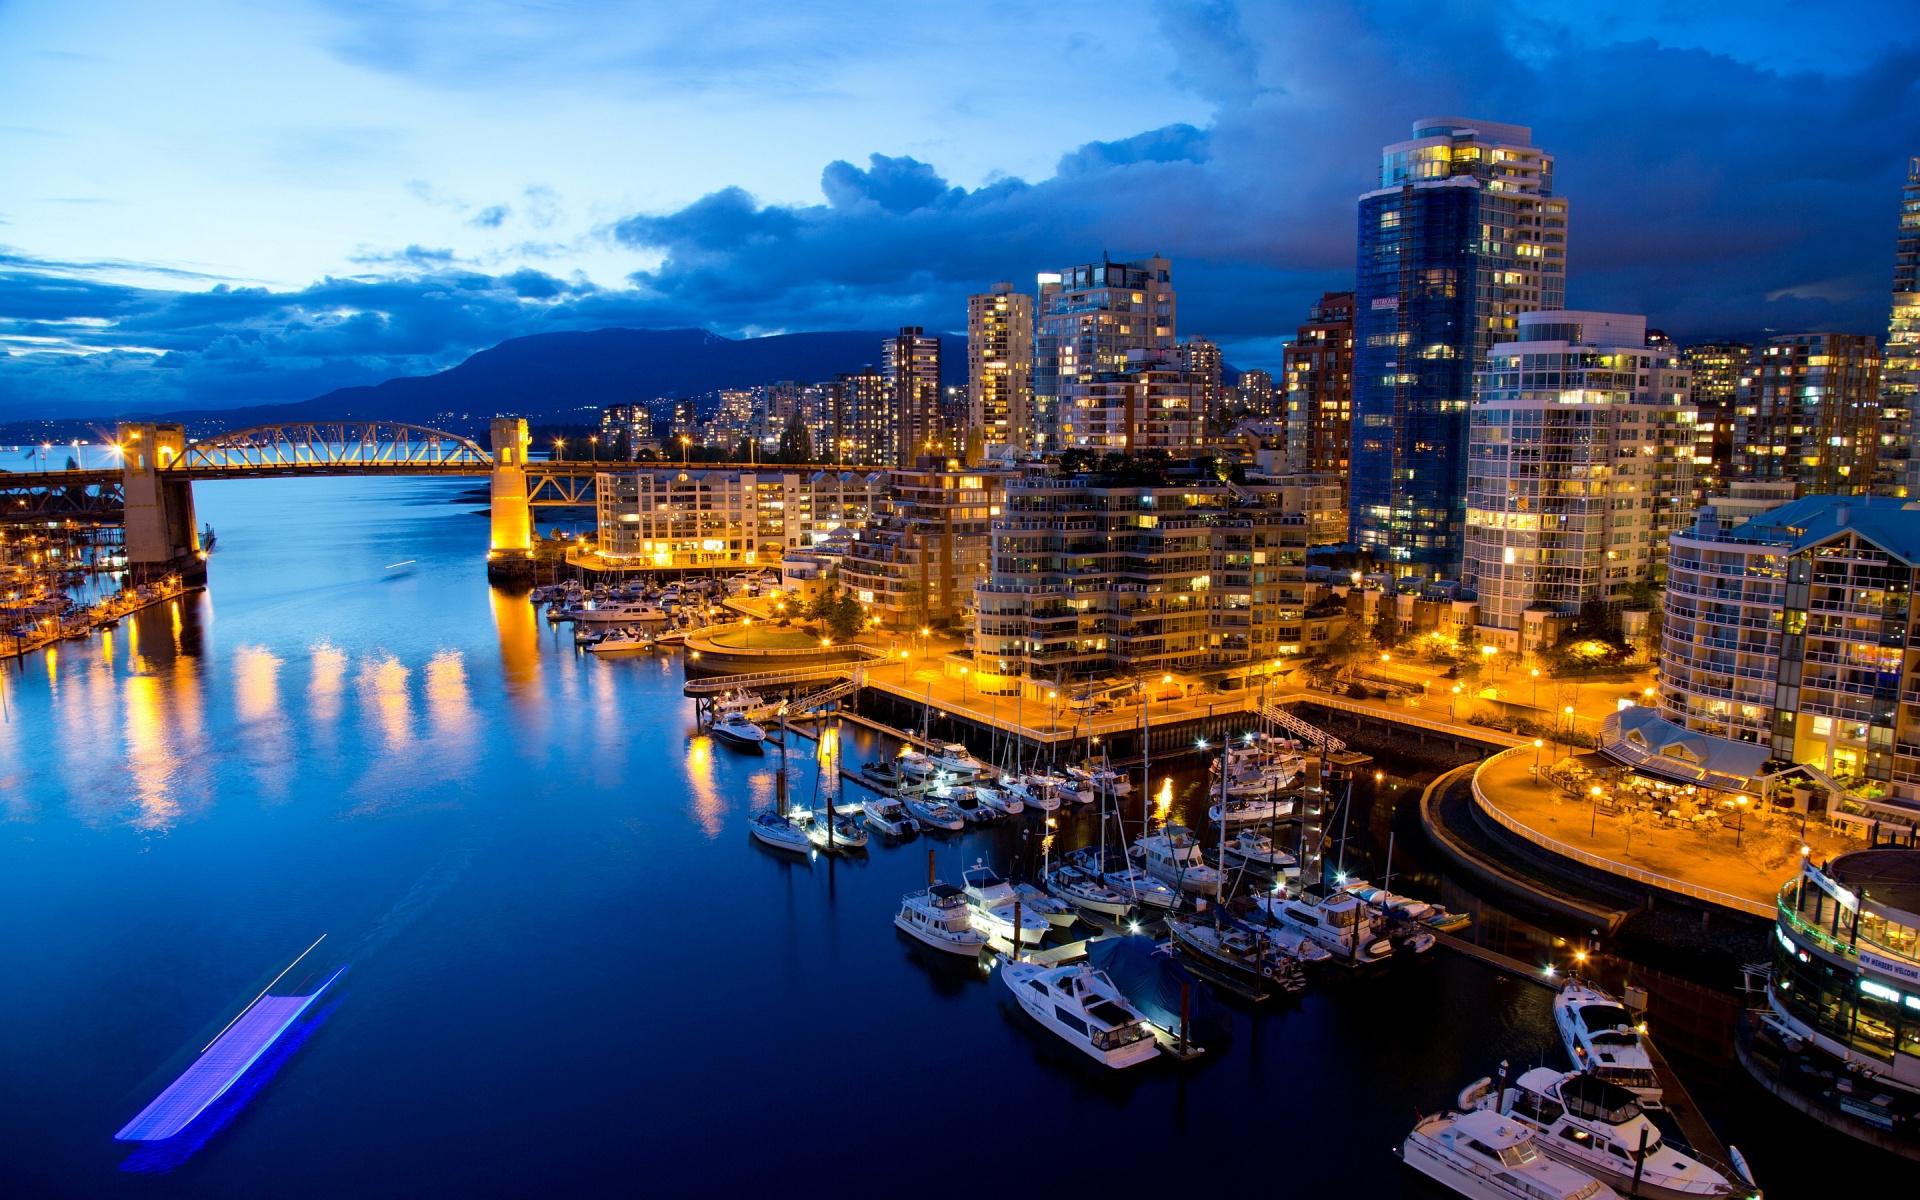 Vancouver Pier